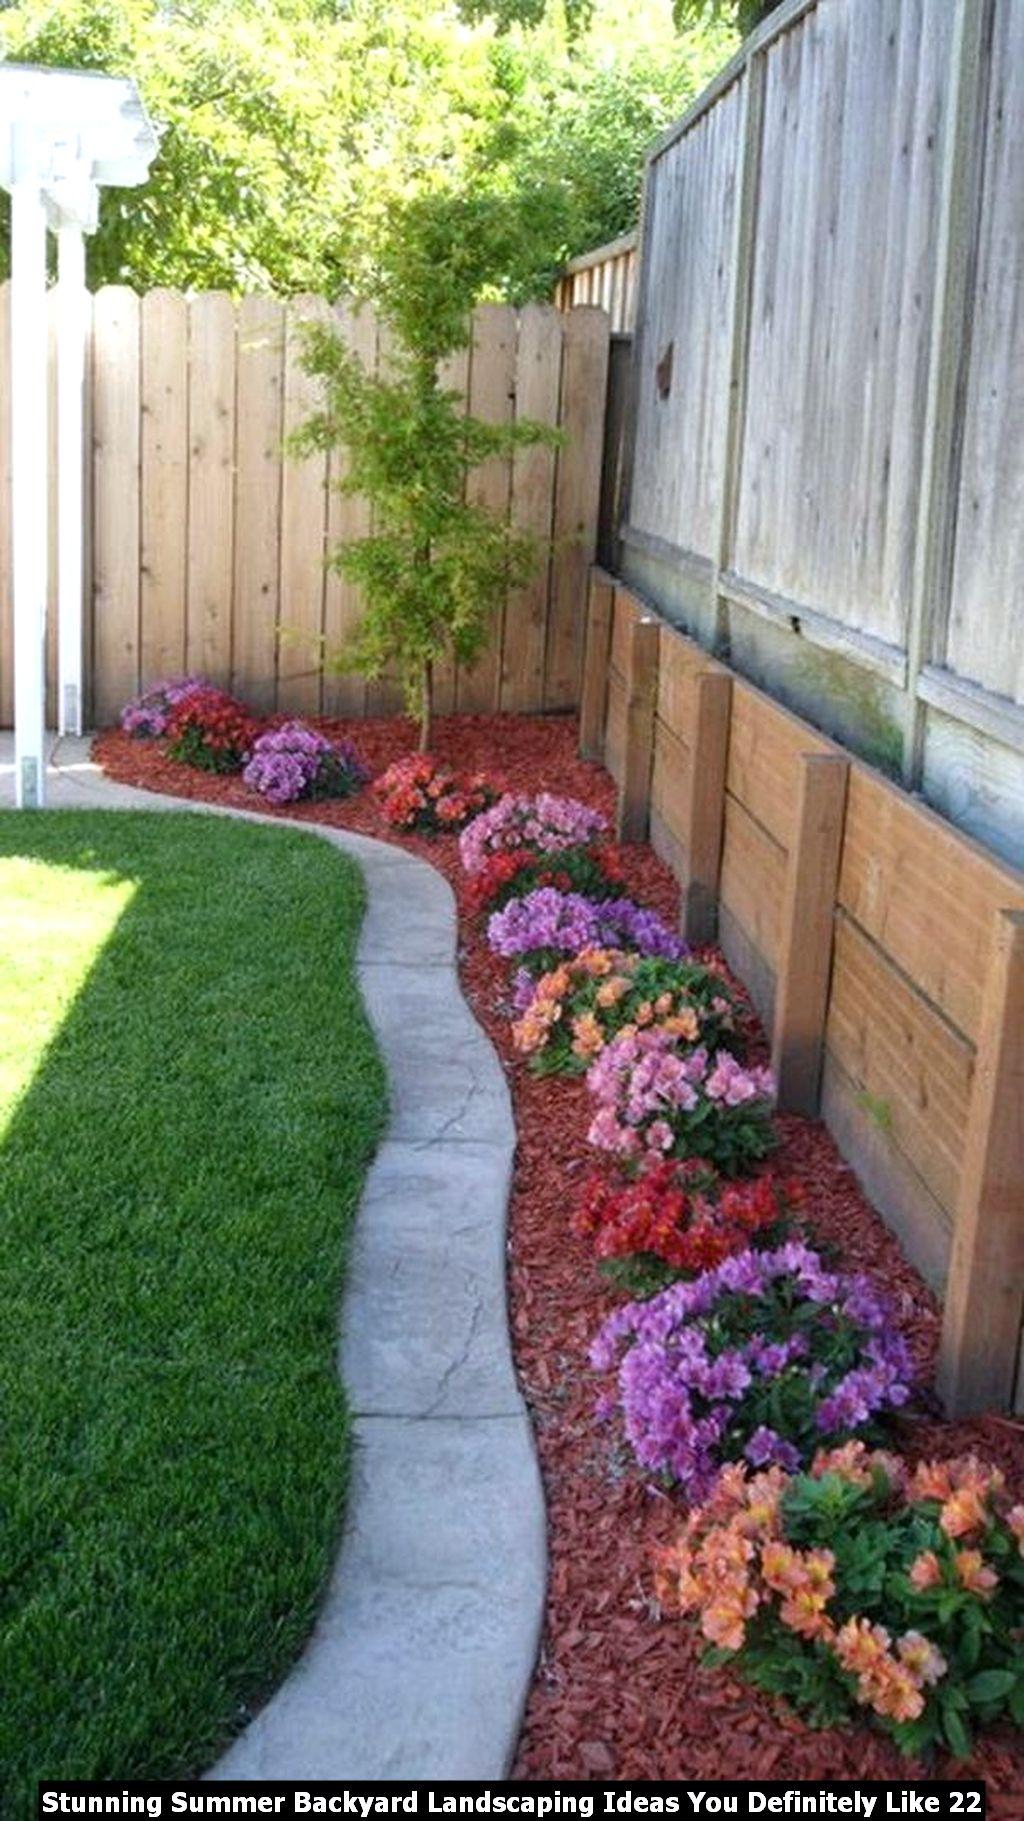 Stunning Summer Backyard Landscaping Ideas You Definitely Like 22